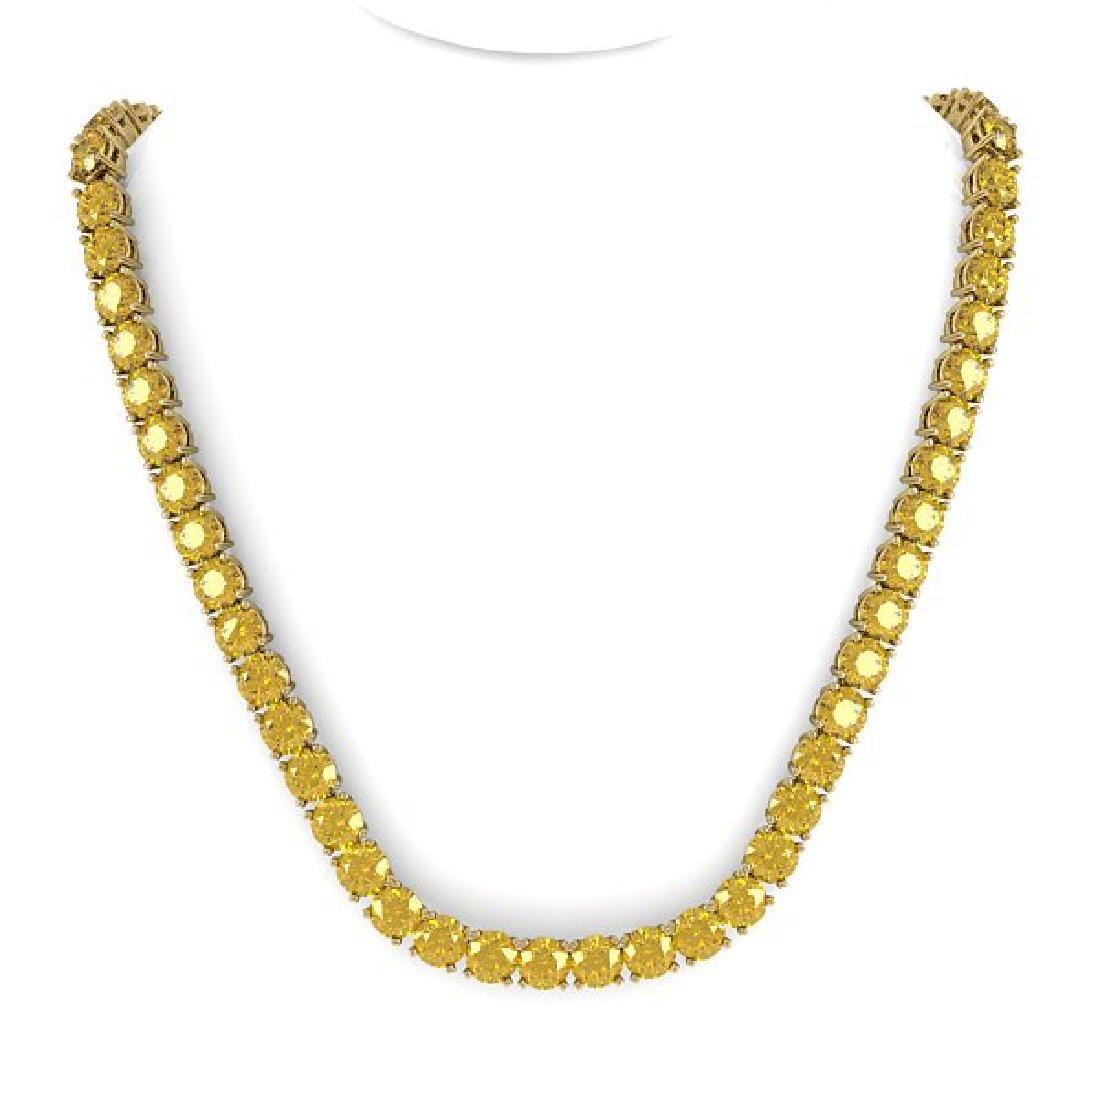 30 CTW Certified Fancy Yellow SI Diamond Necklace 18K - 2